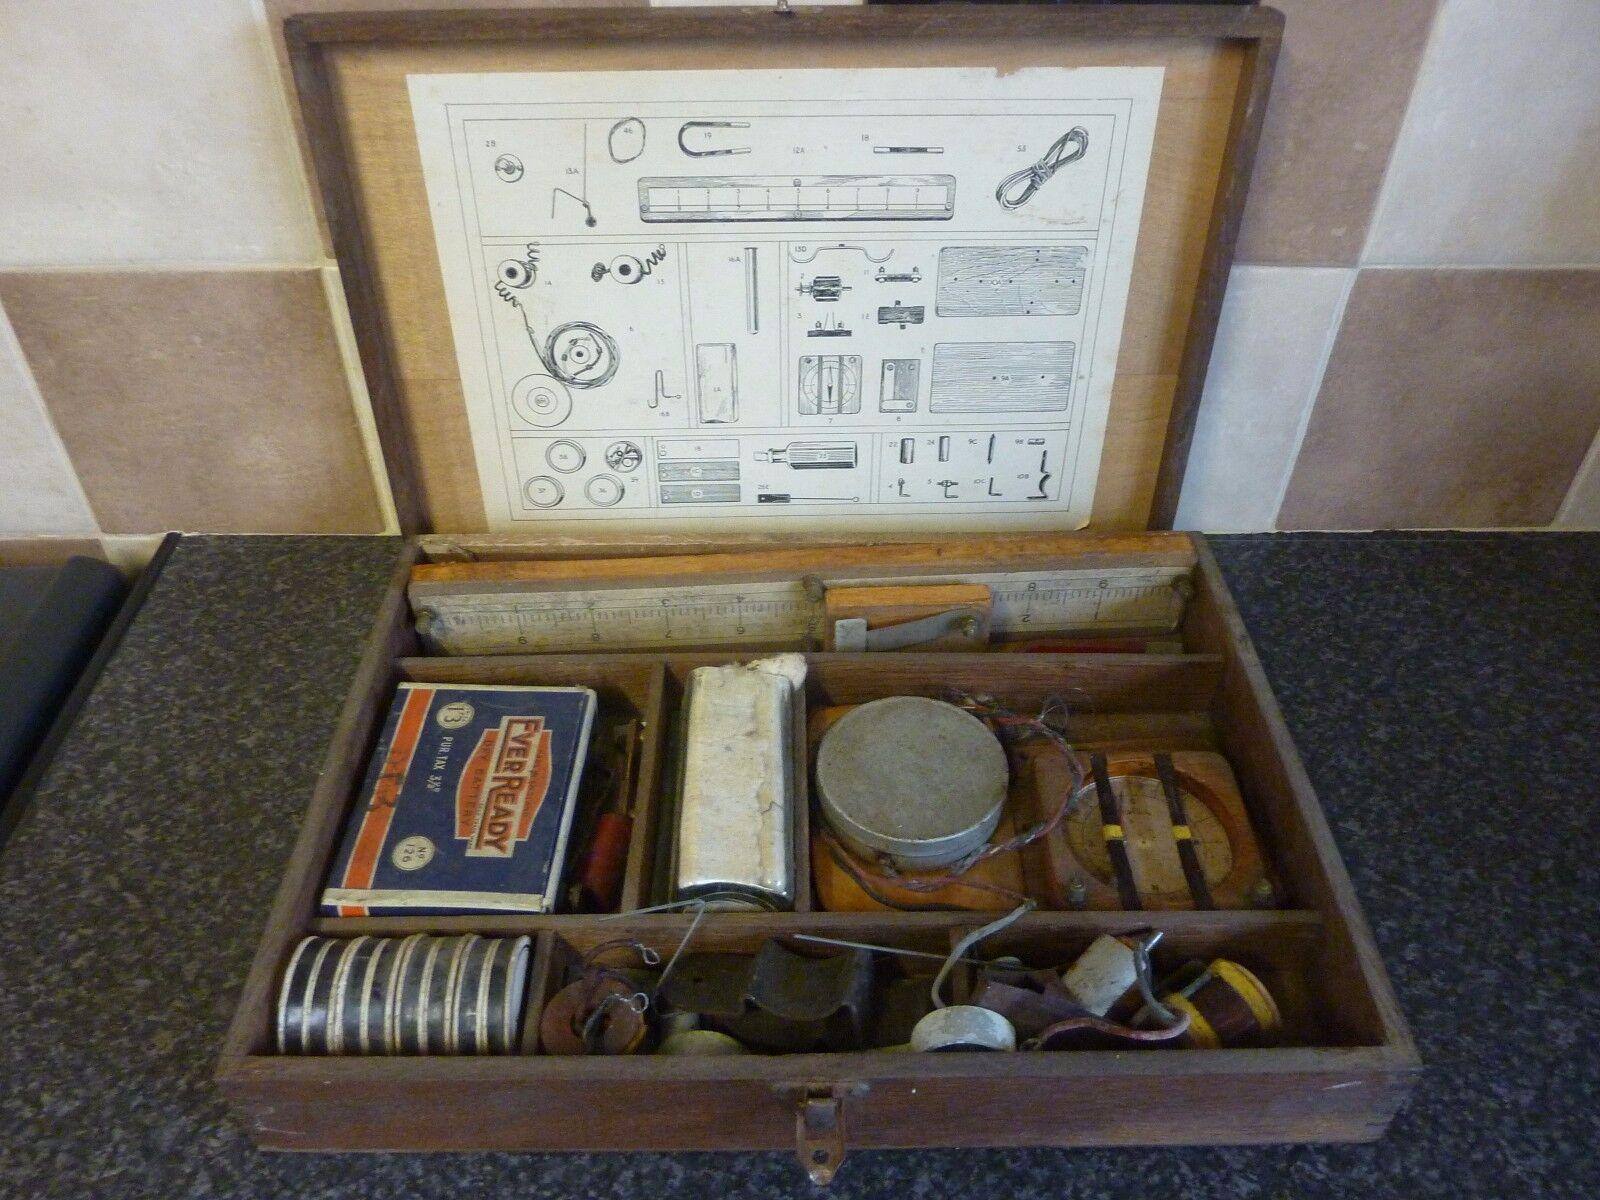 VINTAGE 'STEMEL' ELECTRICAL CONSTRUCTIONAL EDUCATING SET IN ORIGINAL BOX GOOD